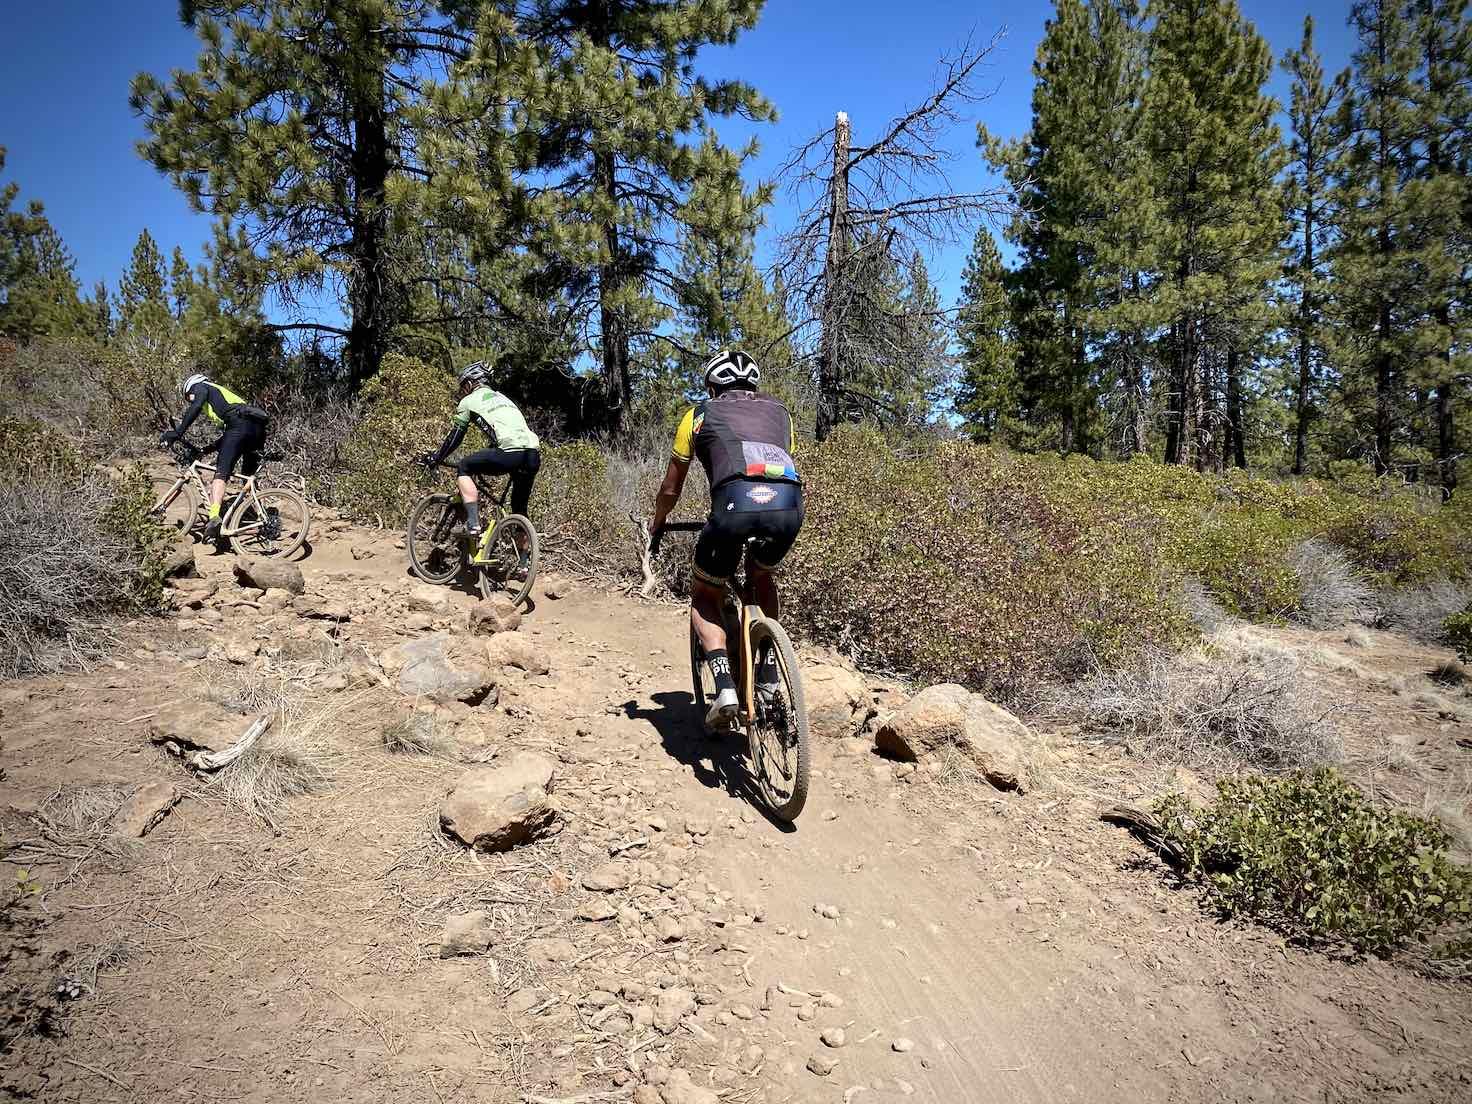 A bit of tech along Ben's trail for gravel cyclists.